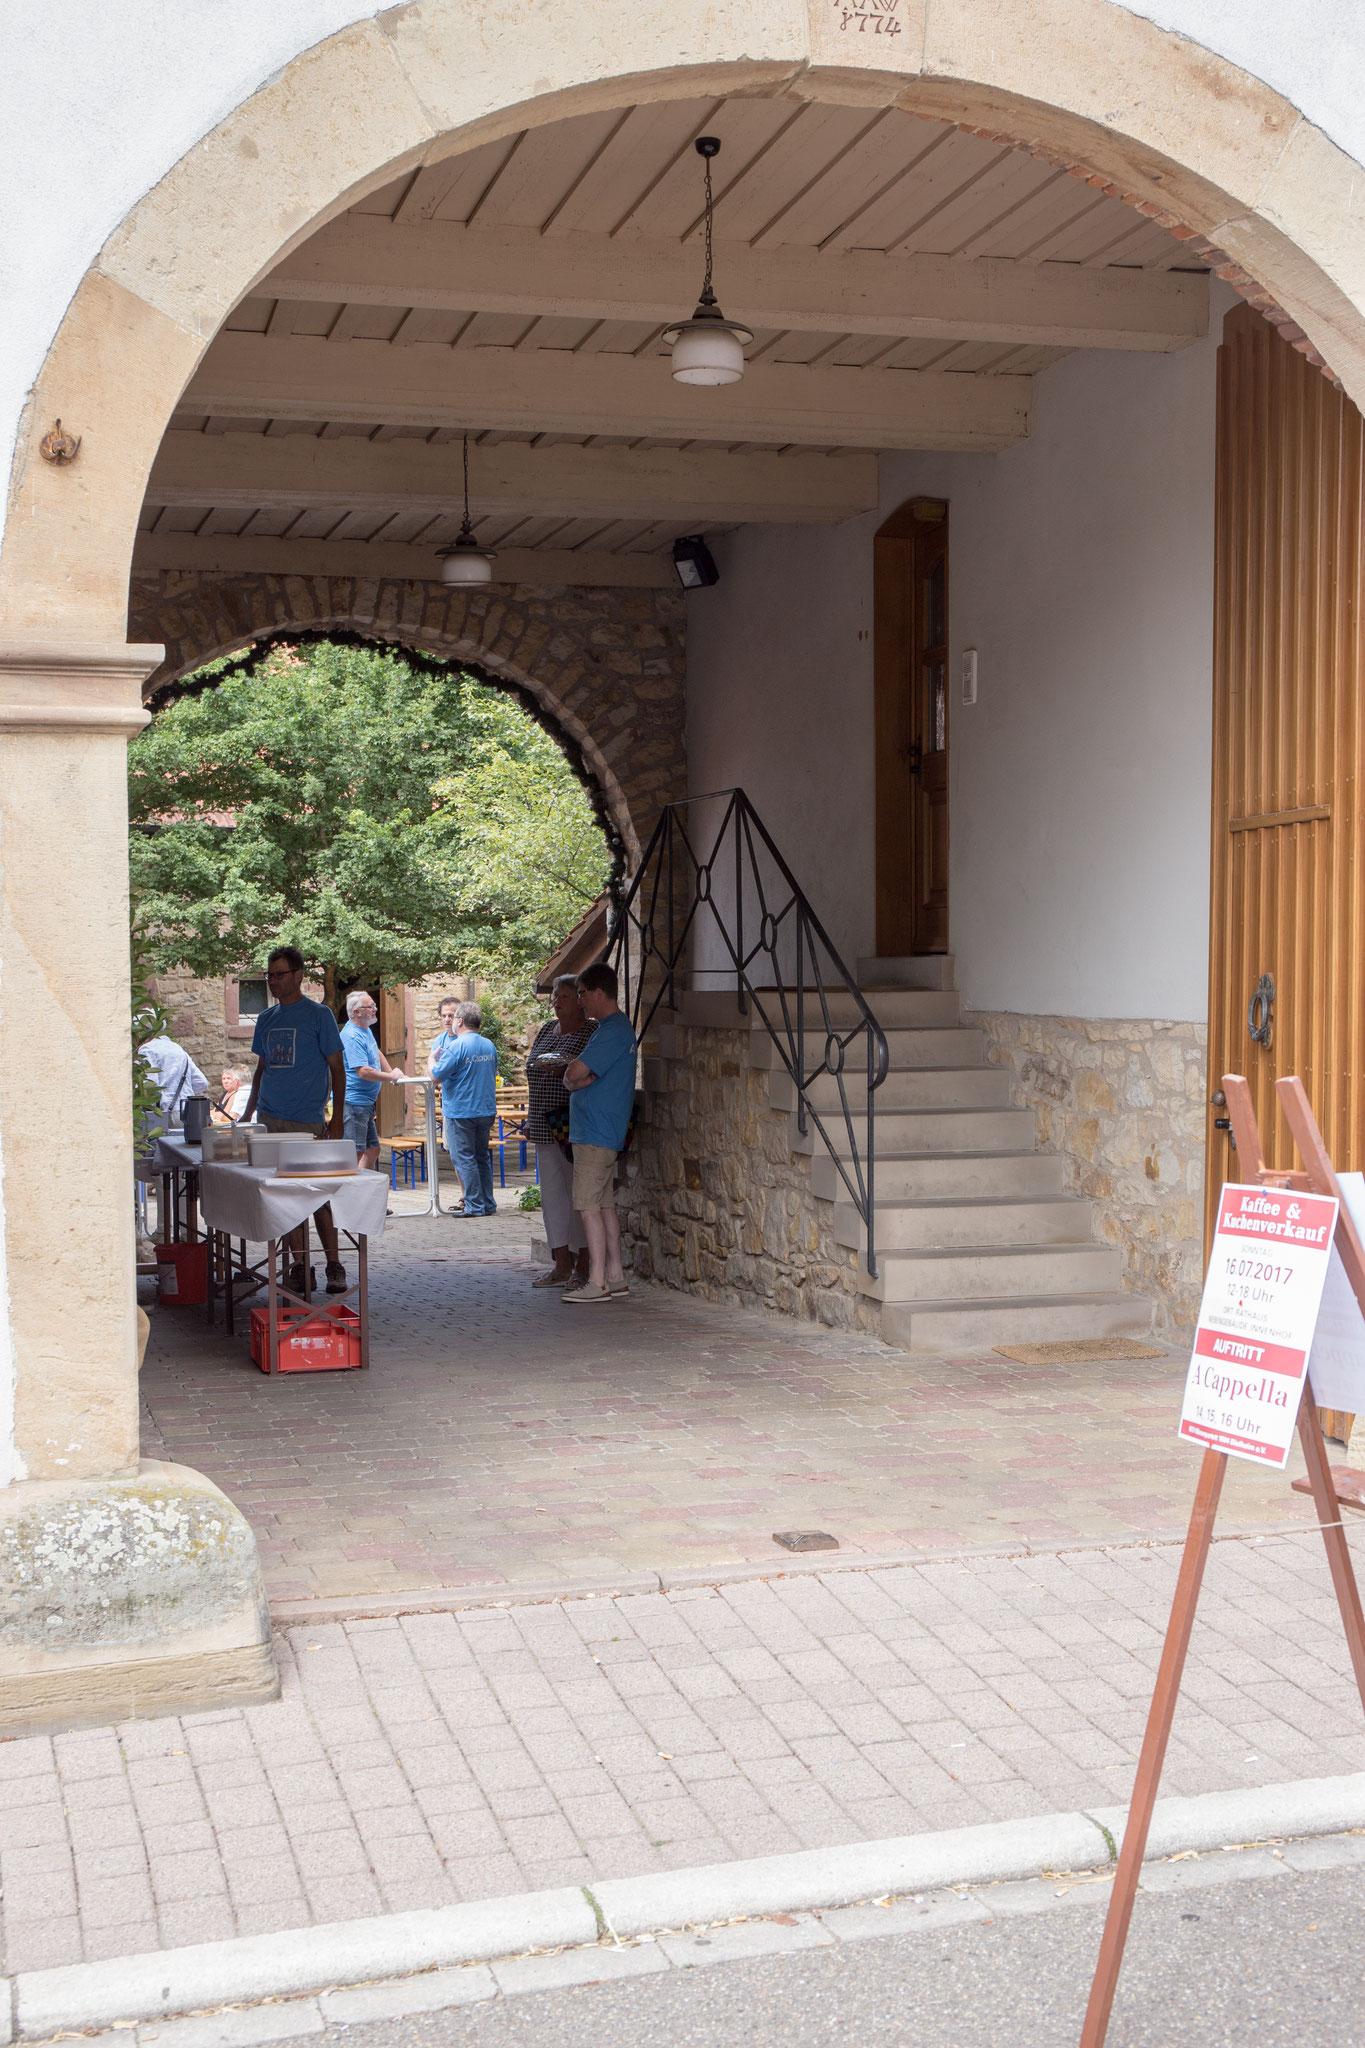 Eingang zum Rathausnebengebäude